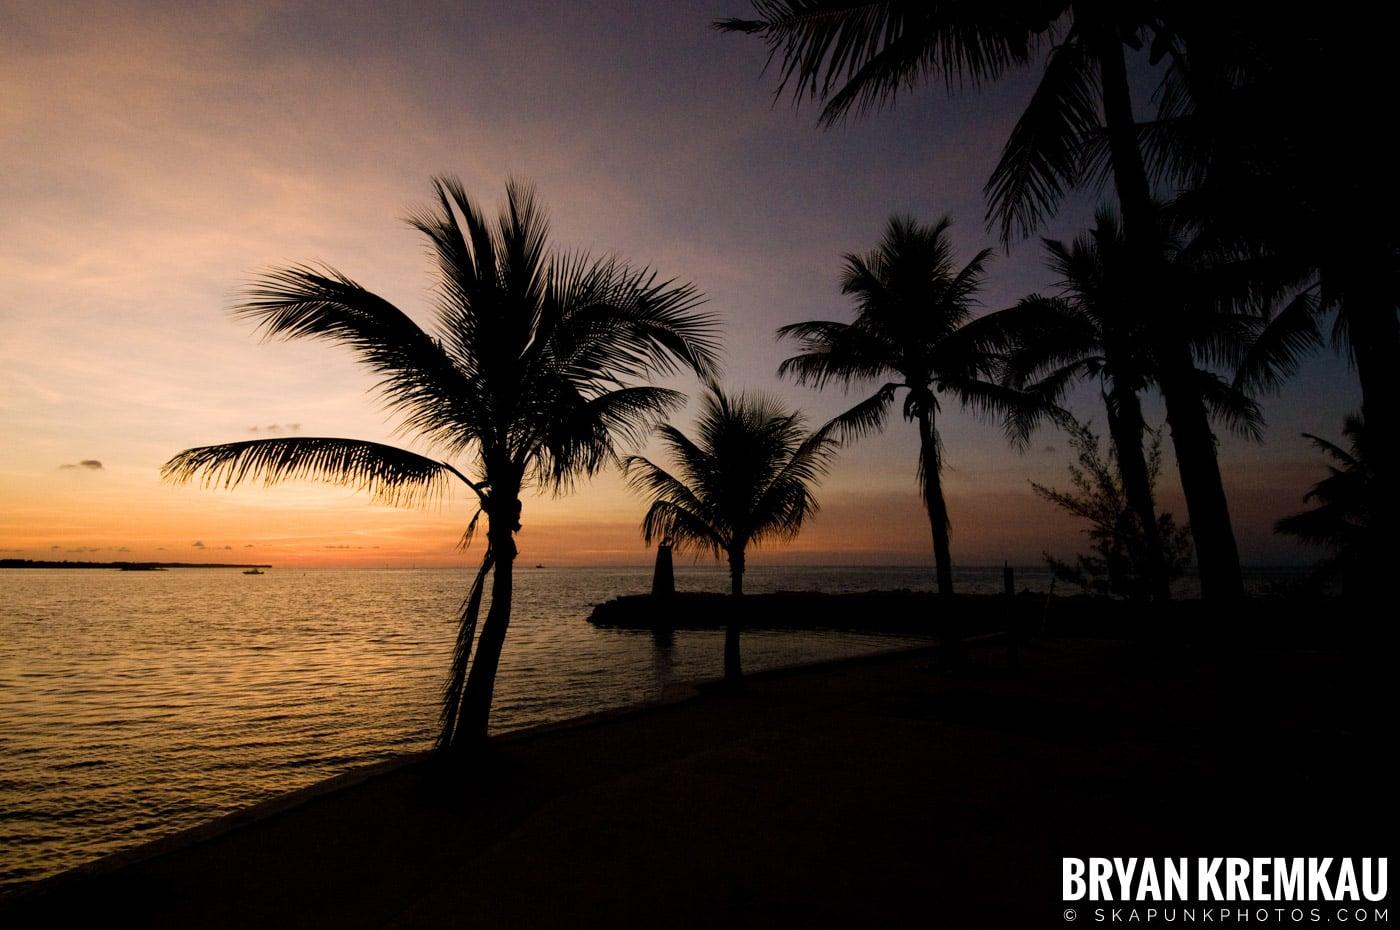 Florida Keys Vacation - 7.09.10 - 7.15.10 (48)